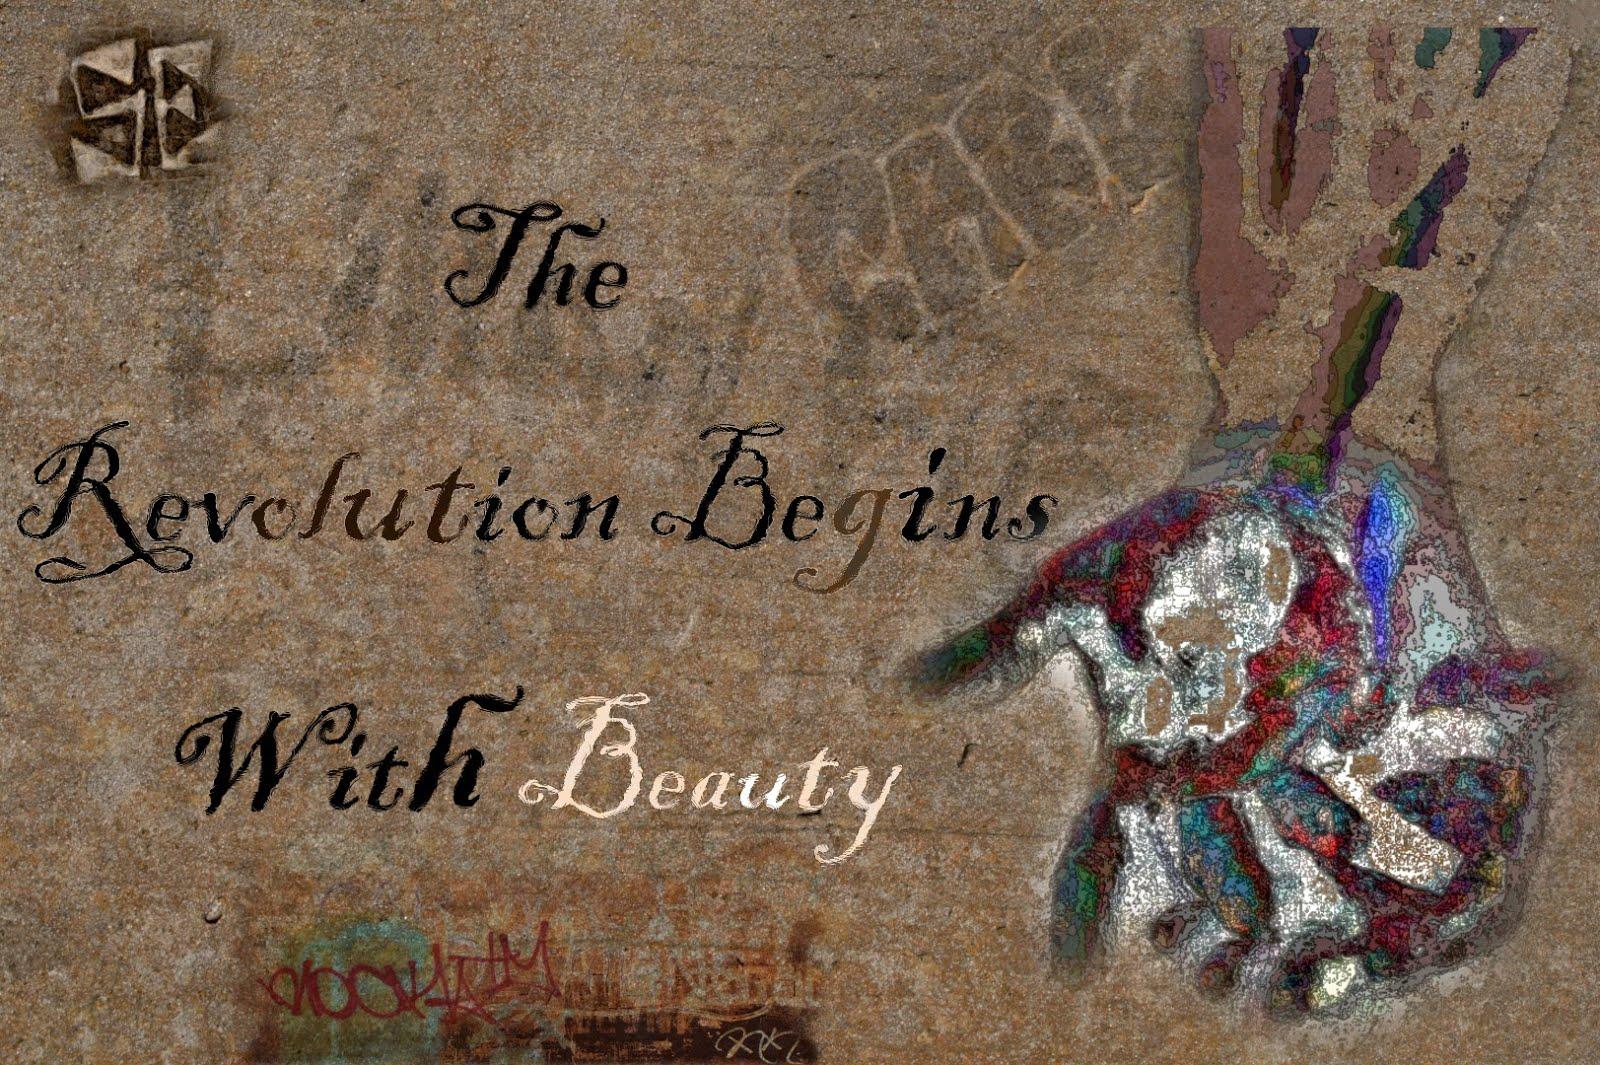 #RevolutionBeauty